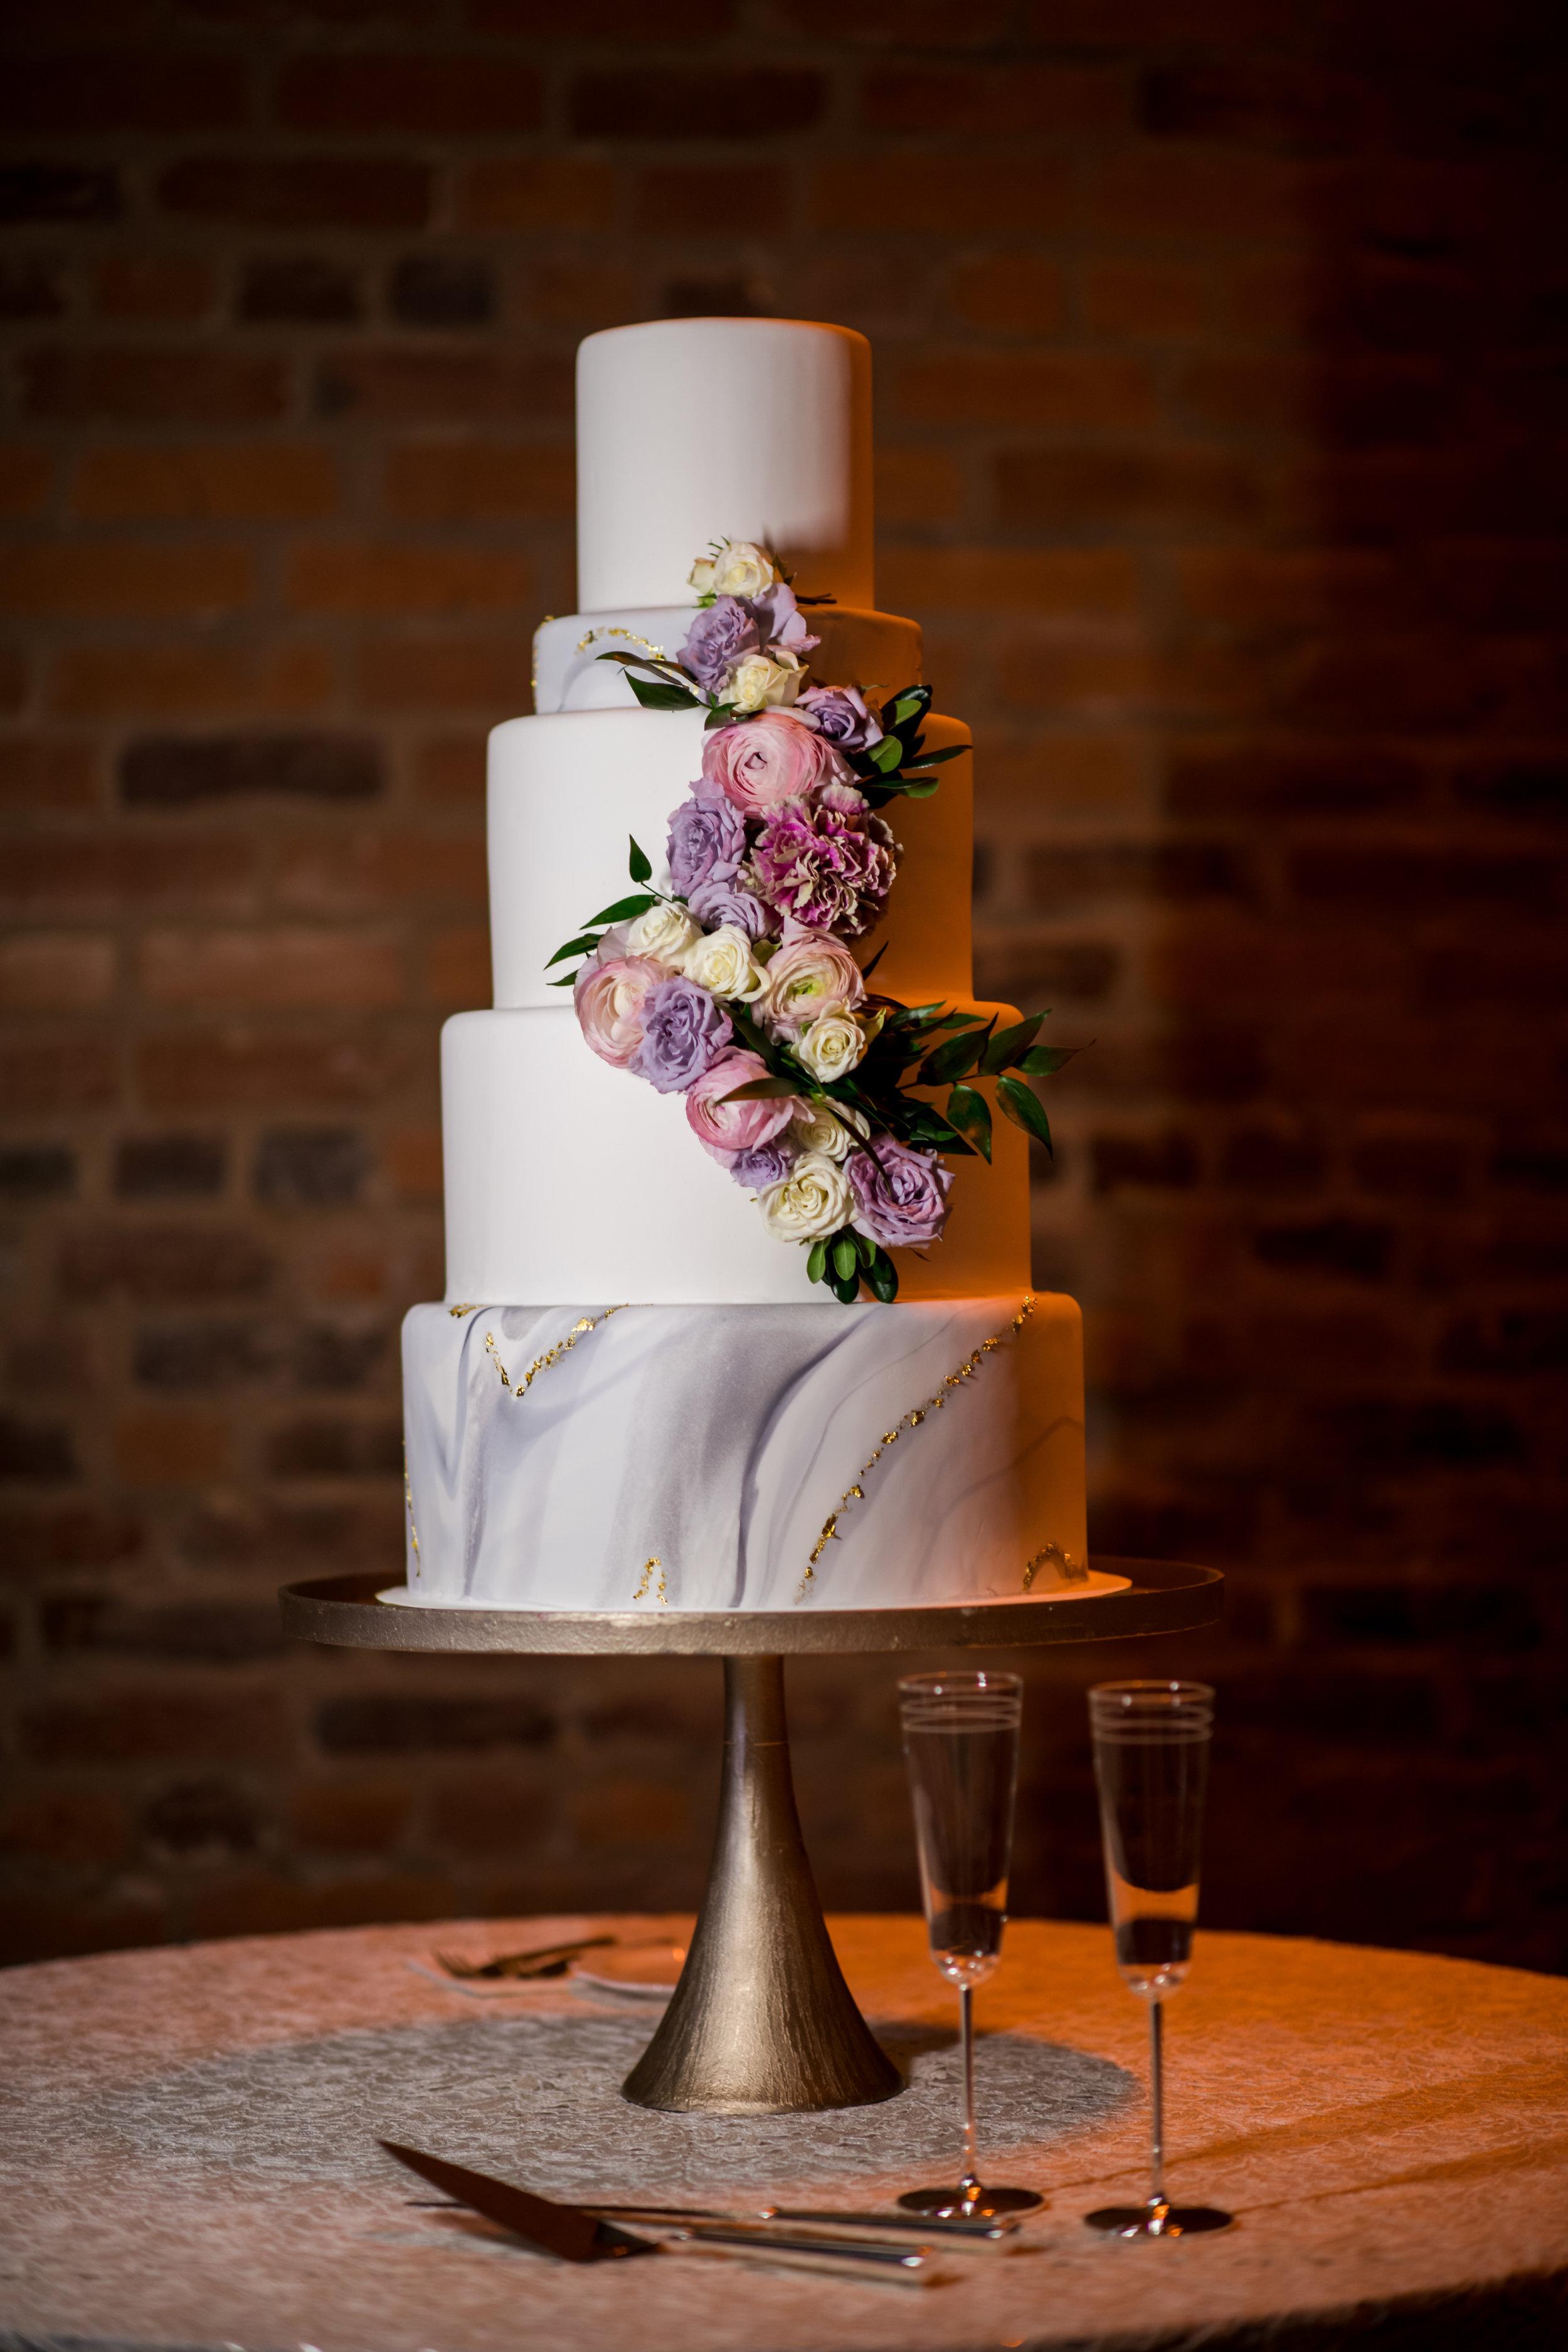 Katie_Dustin_Clementine_Hall_Wedding_Kathy_Thomas_Photography-2702.jpg